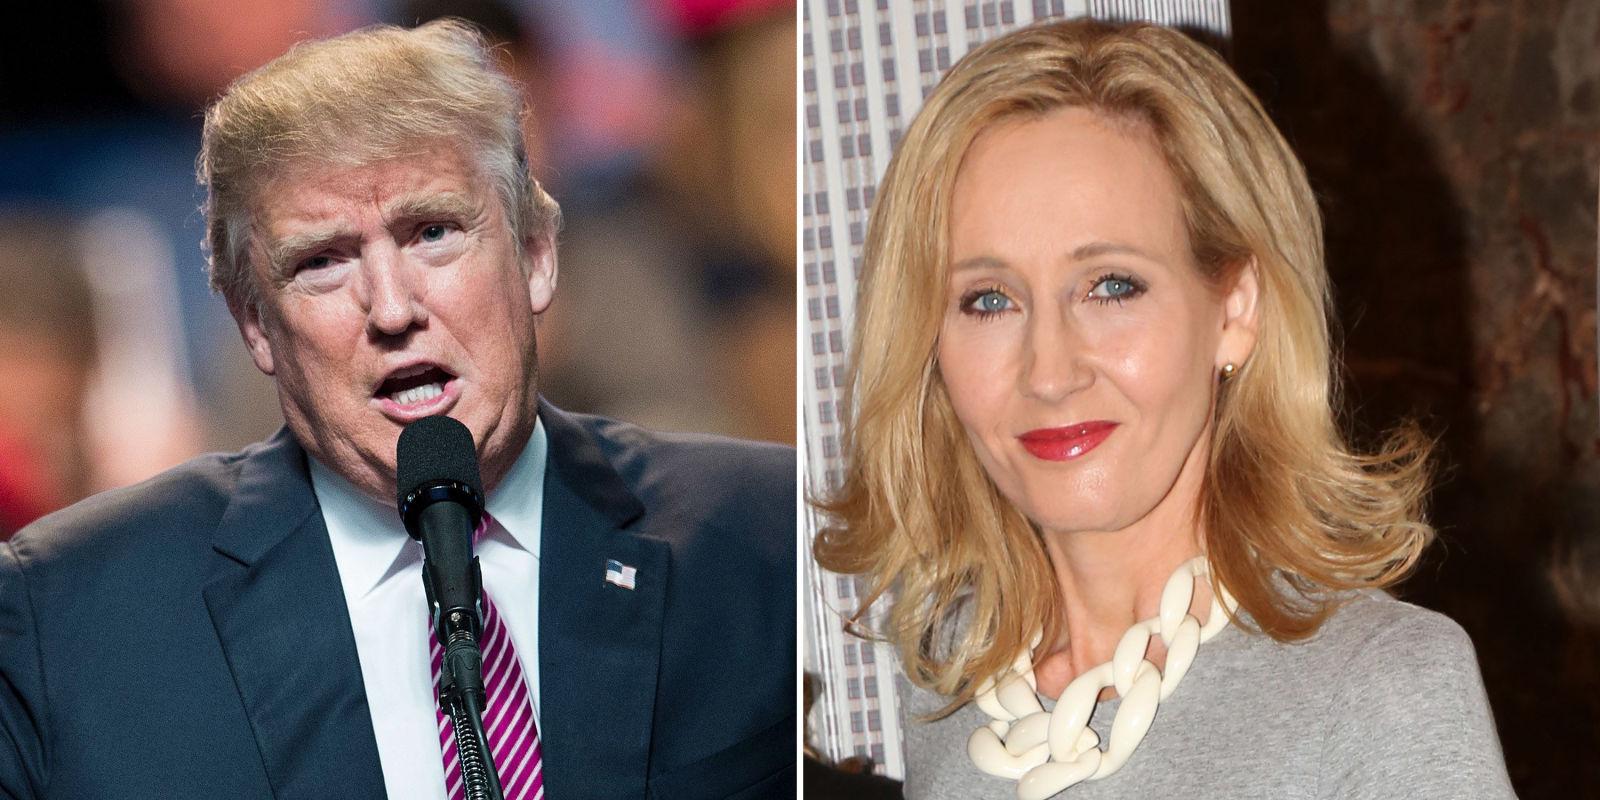 JK Rowling condemns Trump's Charlottesville speech